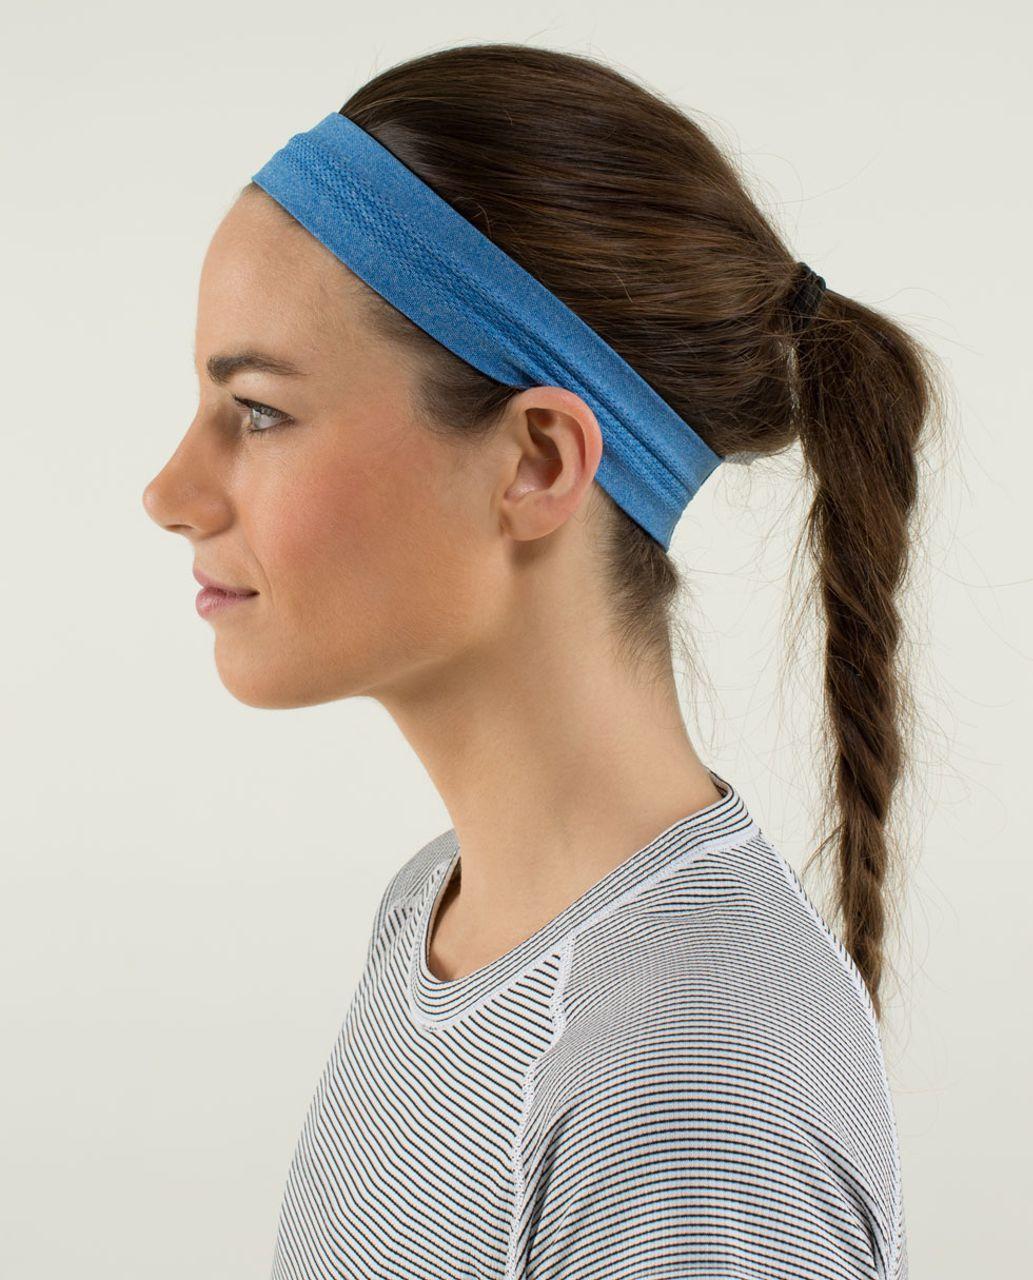 Lululemon Swiftly Headband - Heathered Baroque Blue